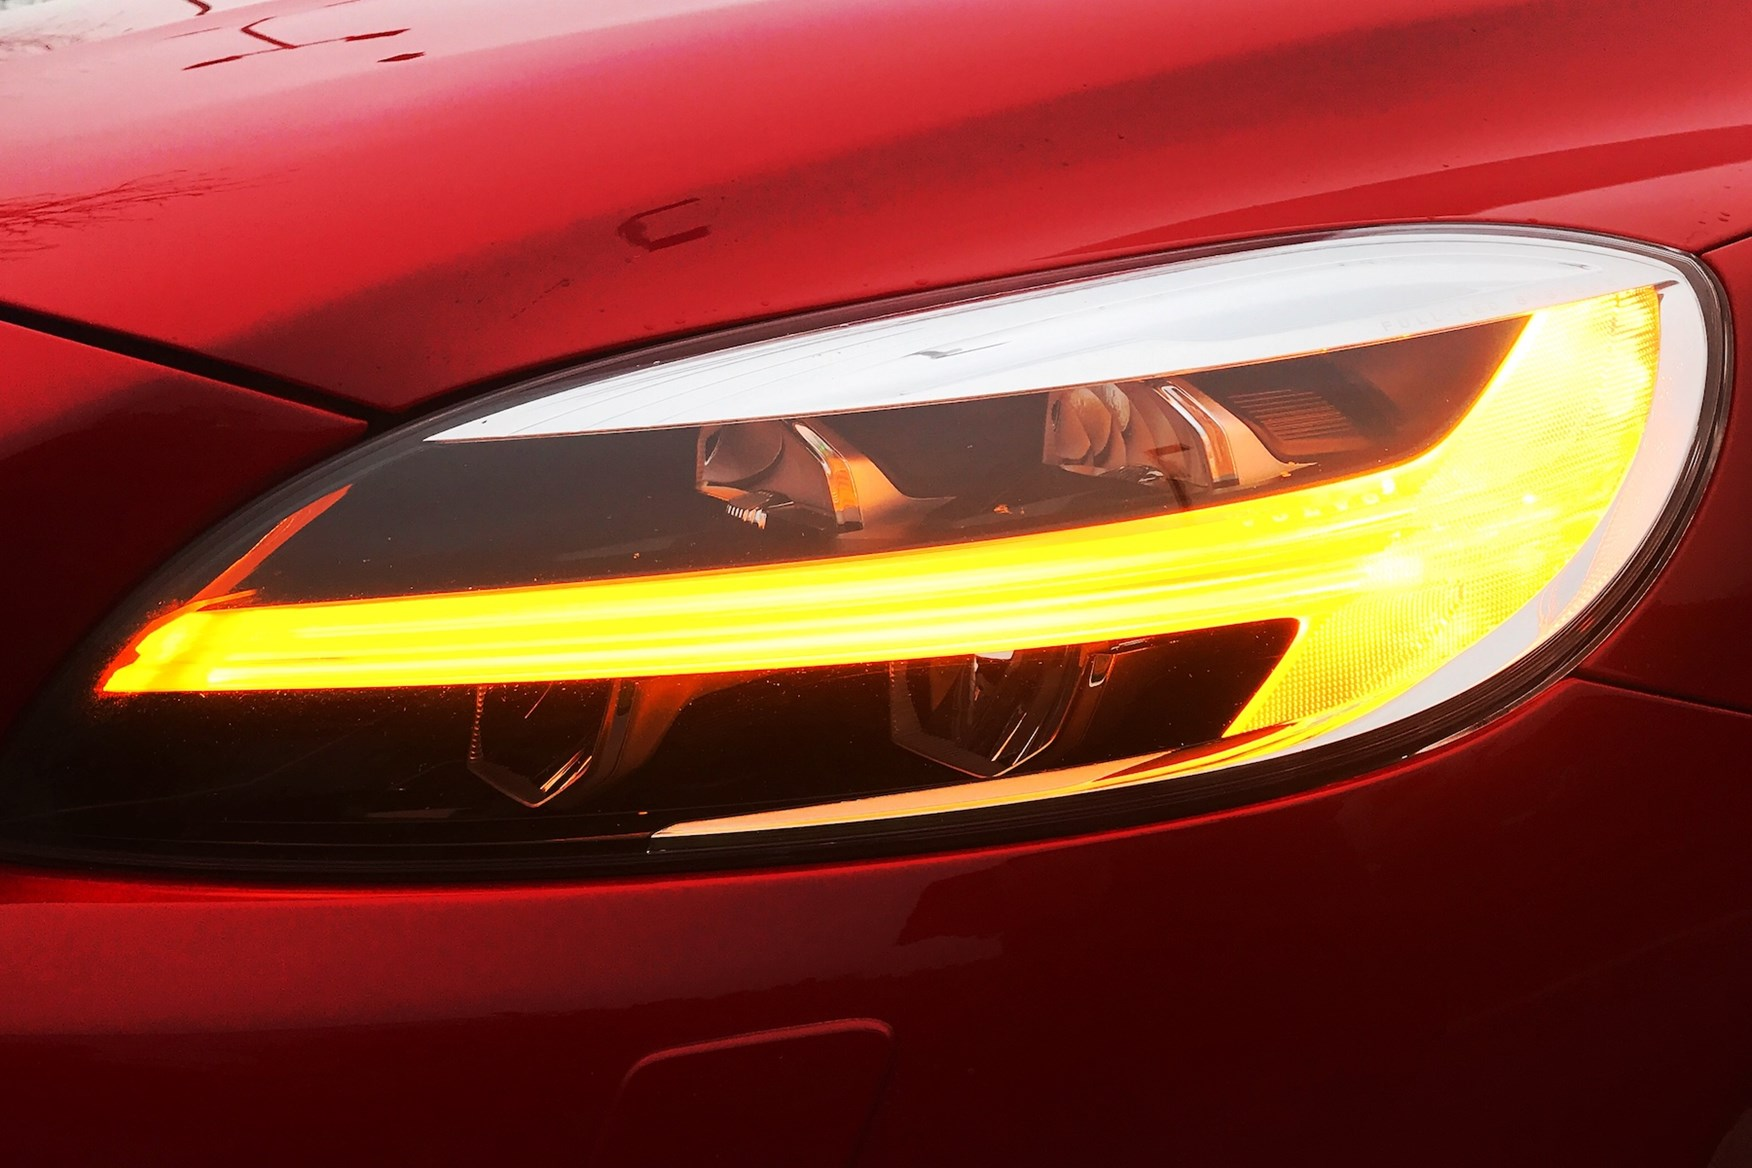 Volvo V40 D4 R-Design Indicators - Passion Red